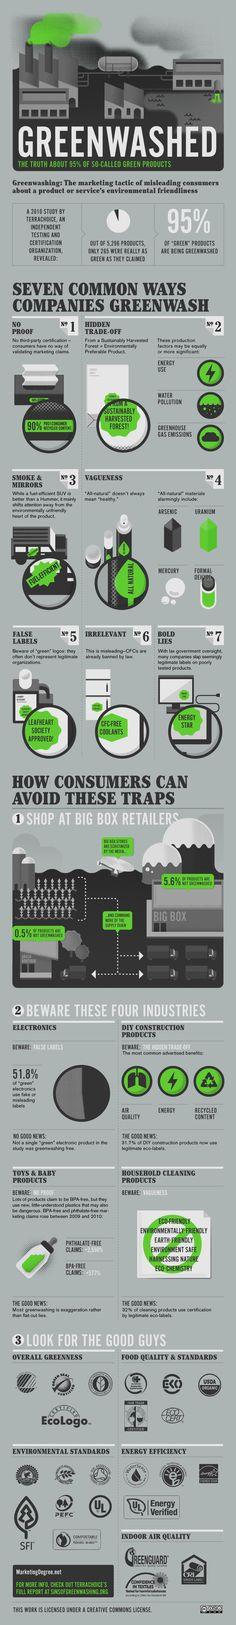 Green Marketing Exposed